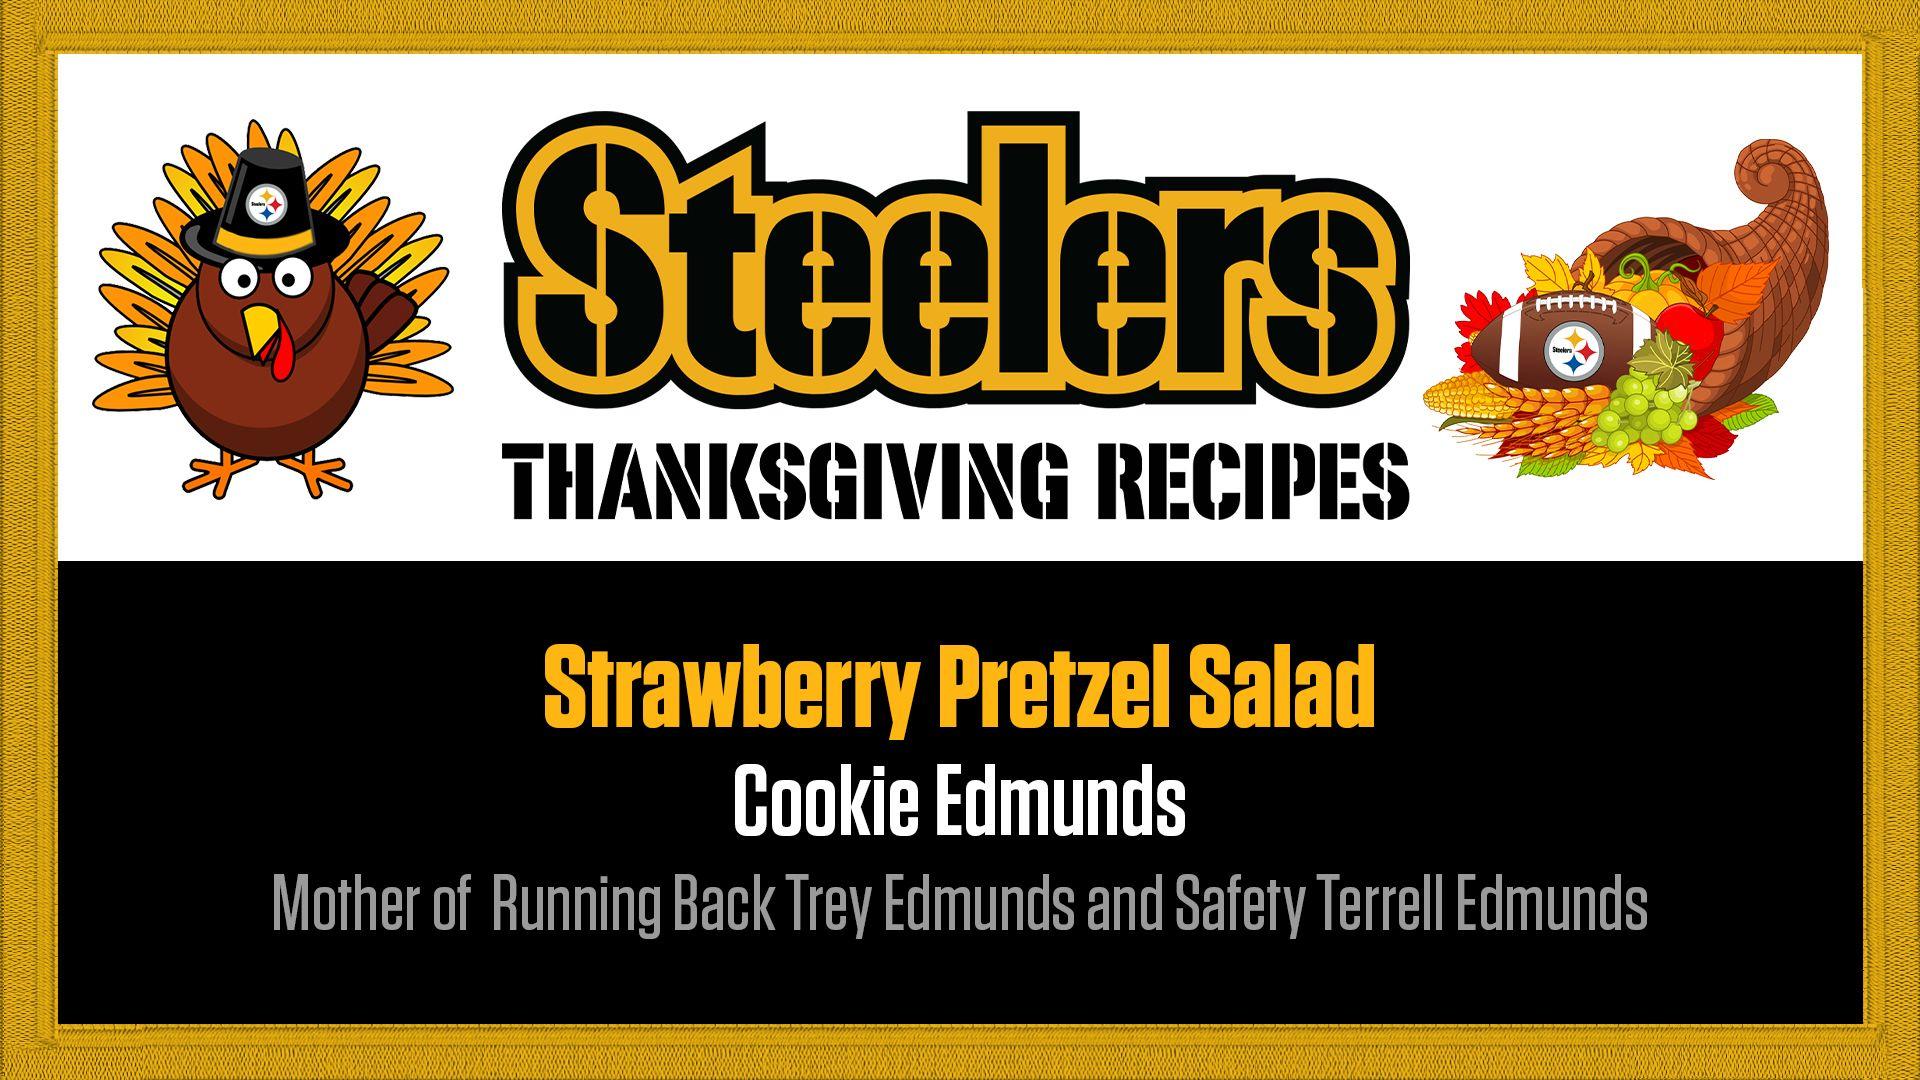 Recipe-strawberry pretzel salad_cookie edmunds